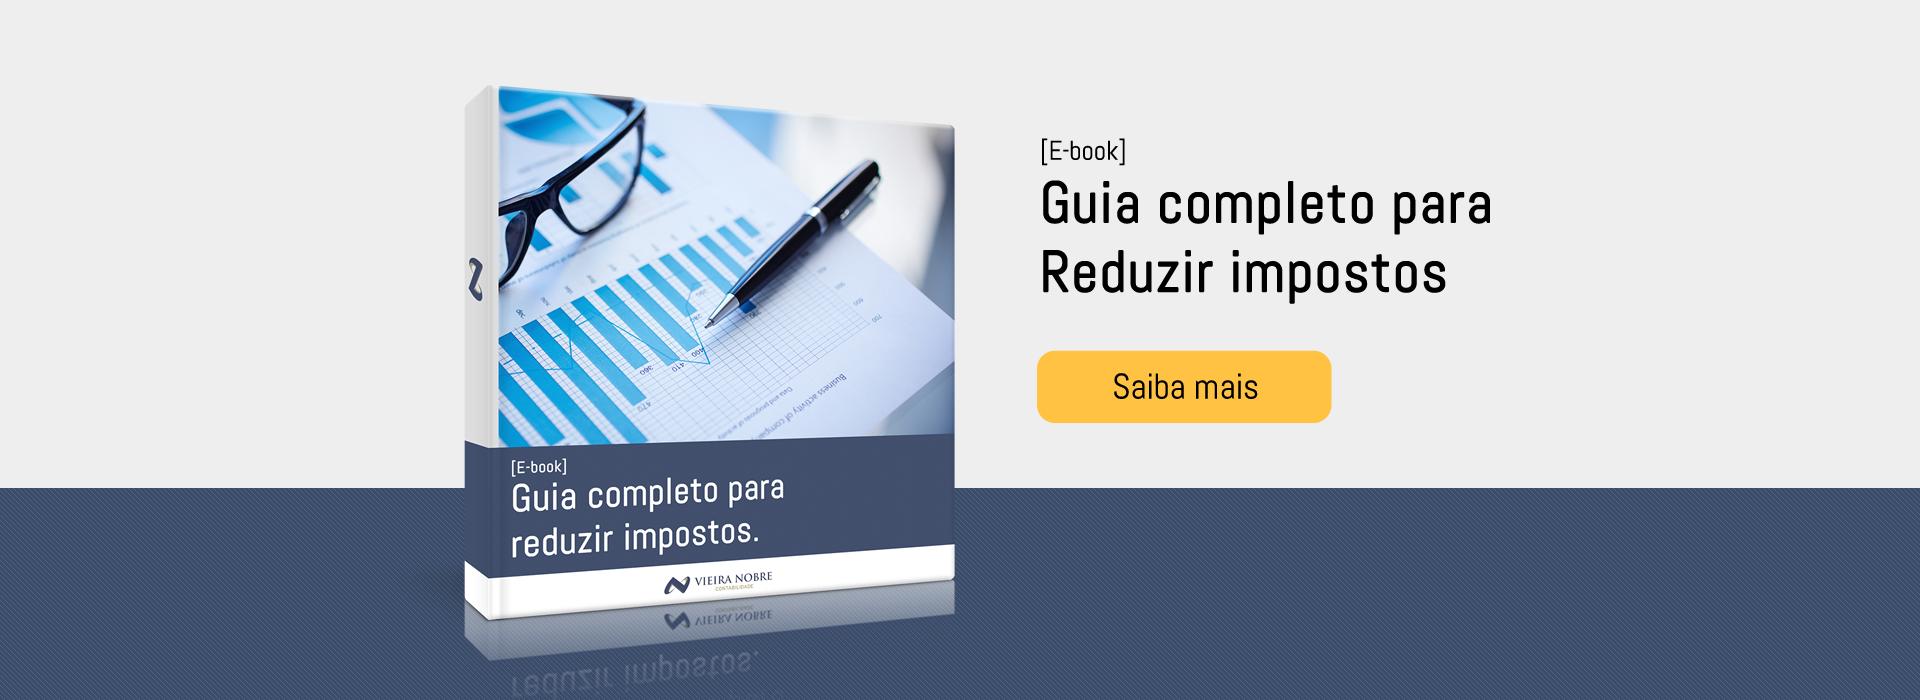 guia-completo-para-reduzir-impostos_banner